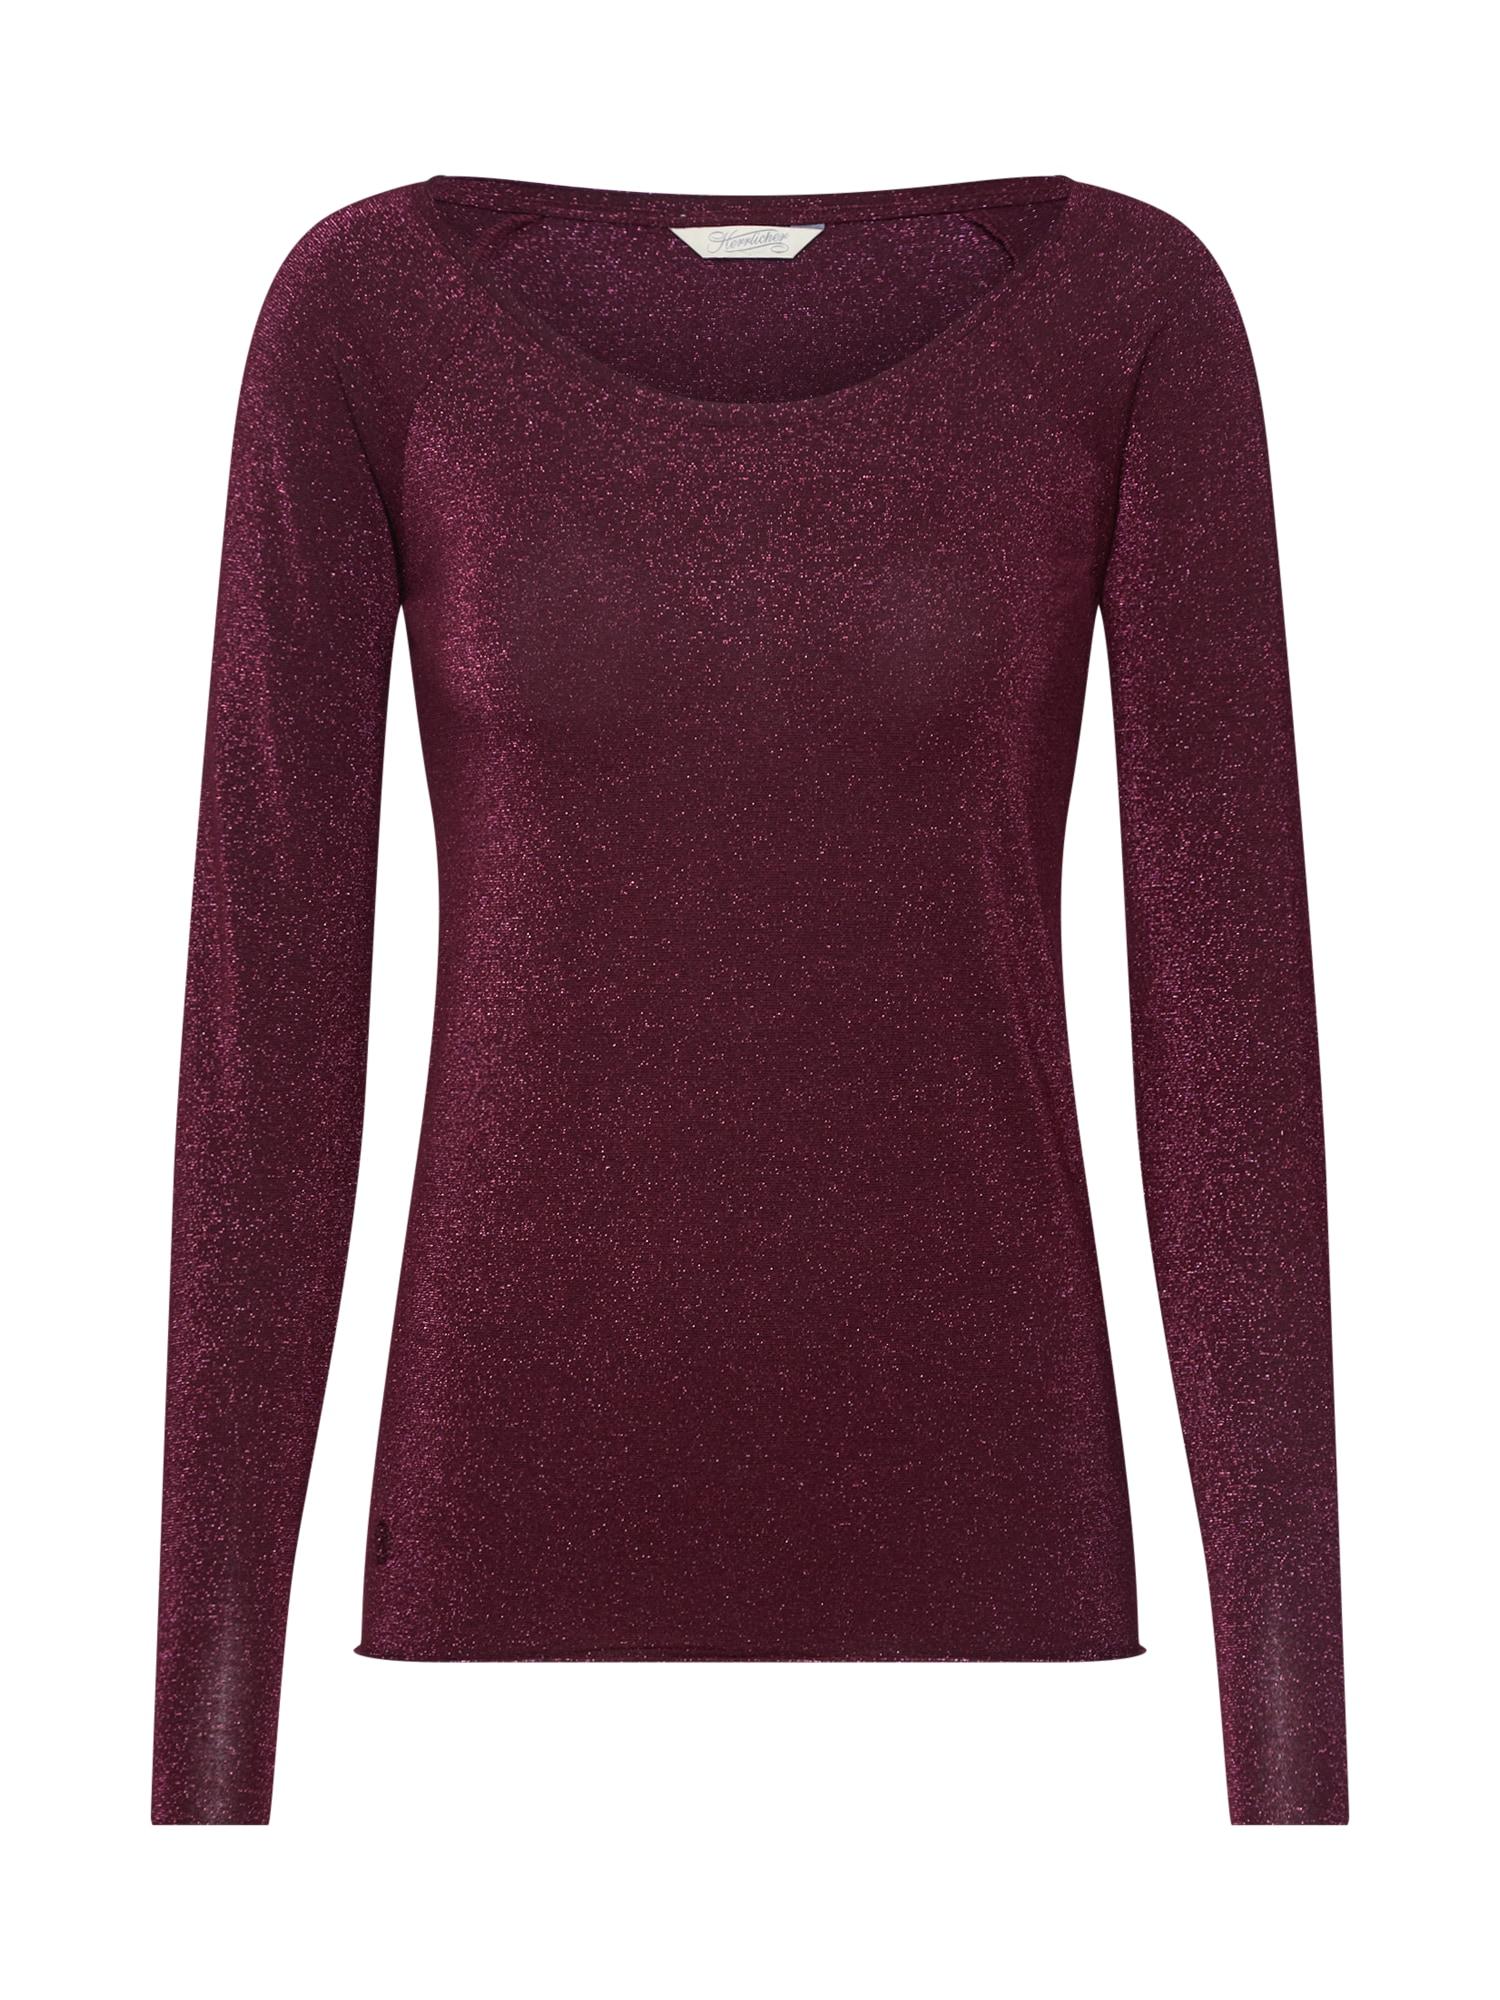 Herrlicher Marškinėliai 'Valencia Glitter Jersey' vyno raudona spalva